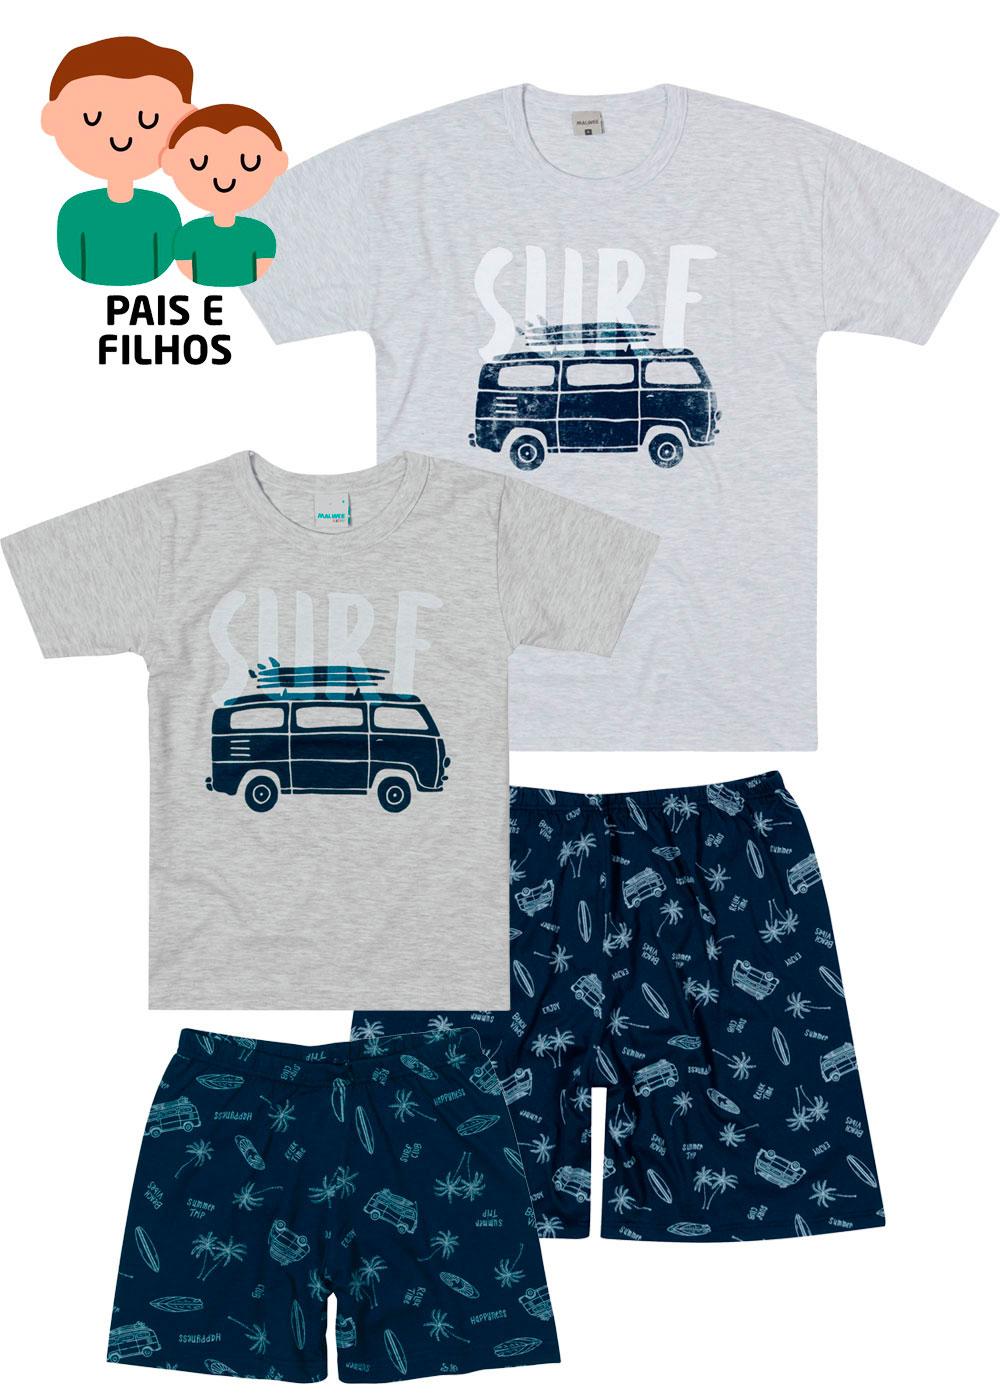 Pijama Curto Pai e Filho Surf Cinza - Malwee